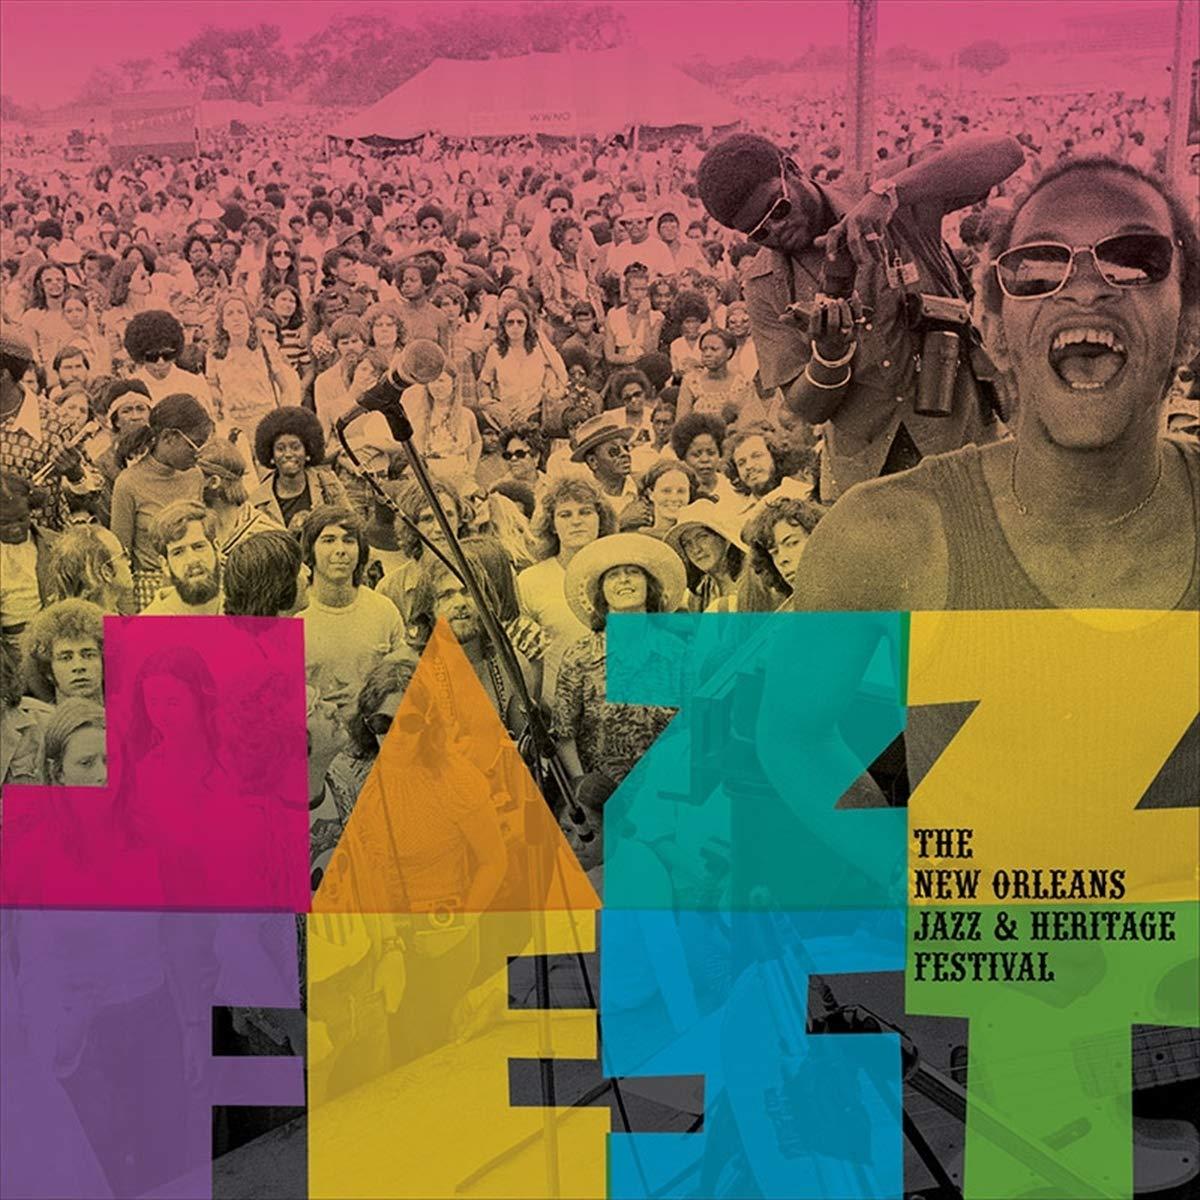 Jazz Fest: The New Orleans Jazz & Heritage Festival by Smithsonian Folkways